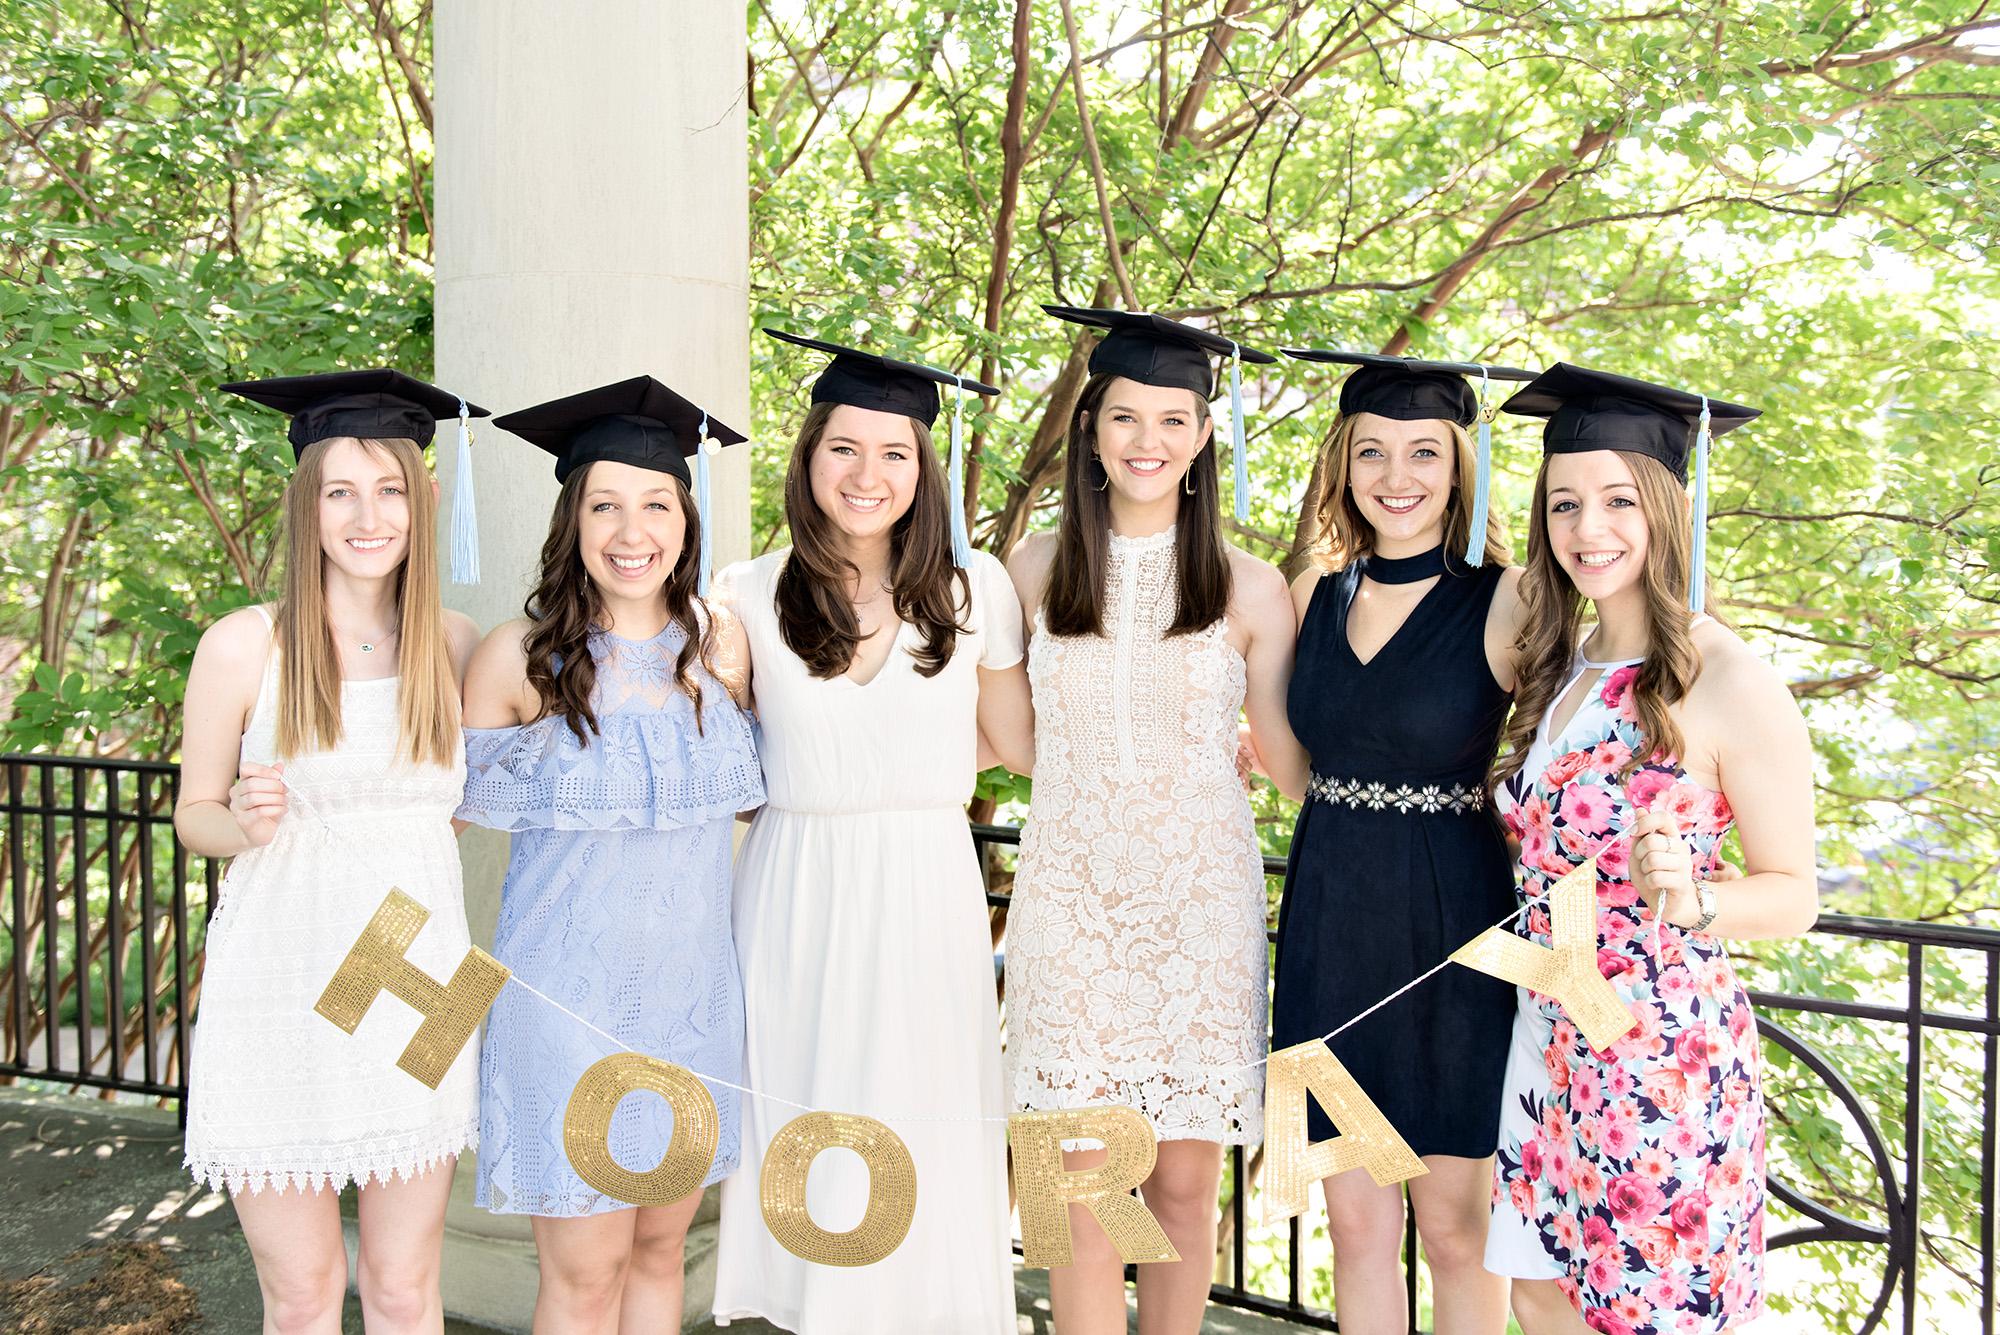 GraduationDay_41.jpg